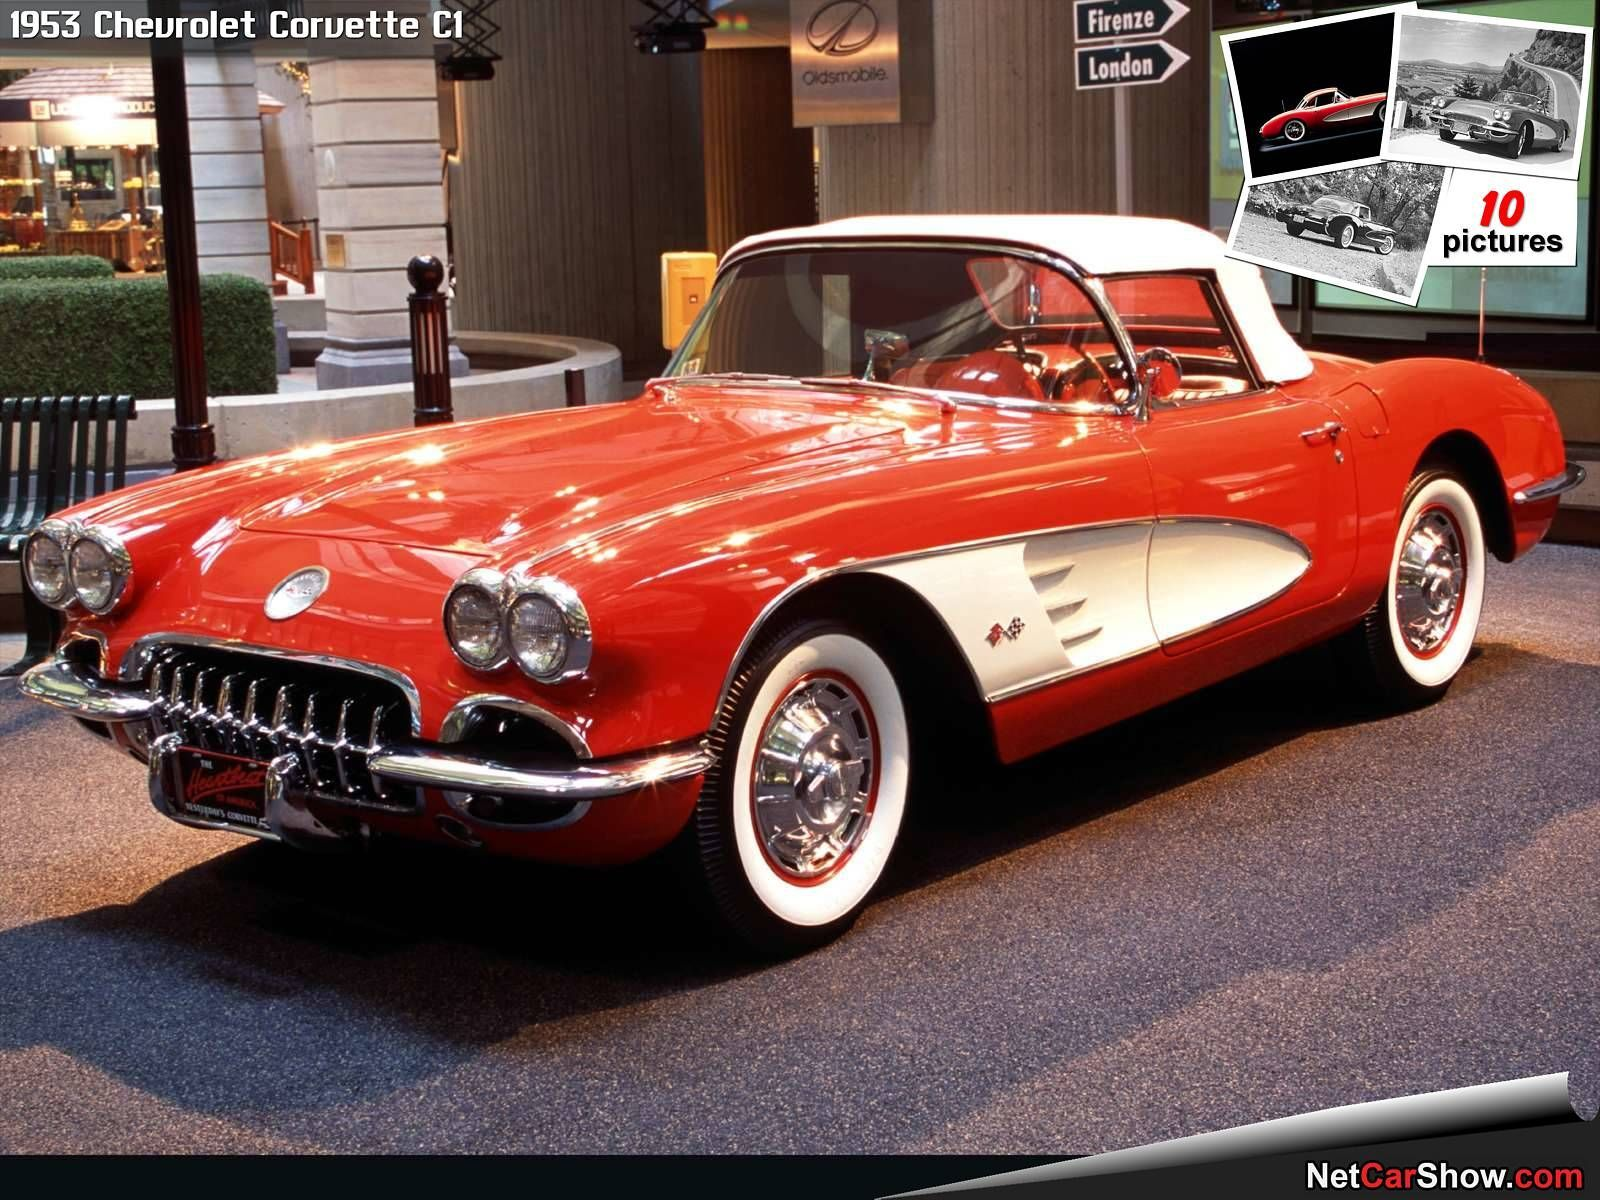 Kekurangan Corvette 1953 Spesifikasi